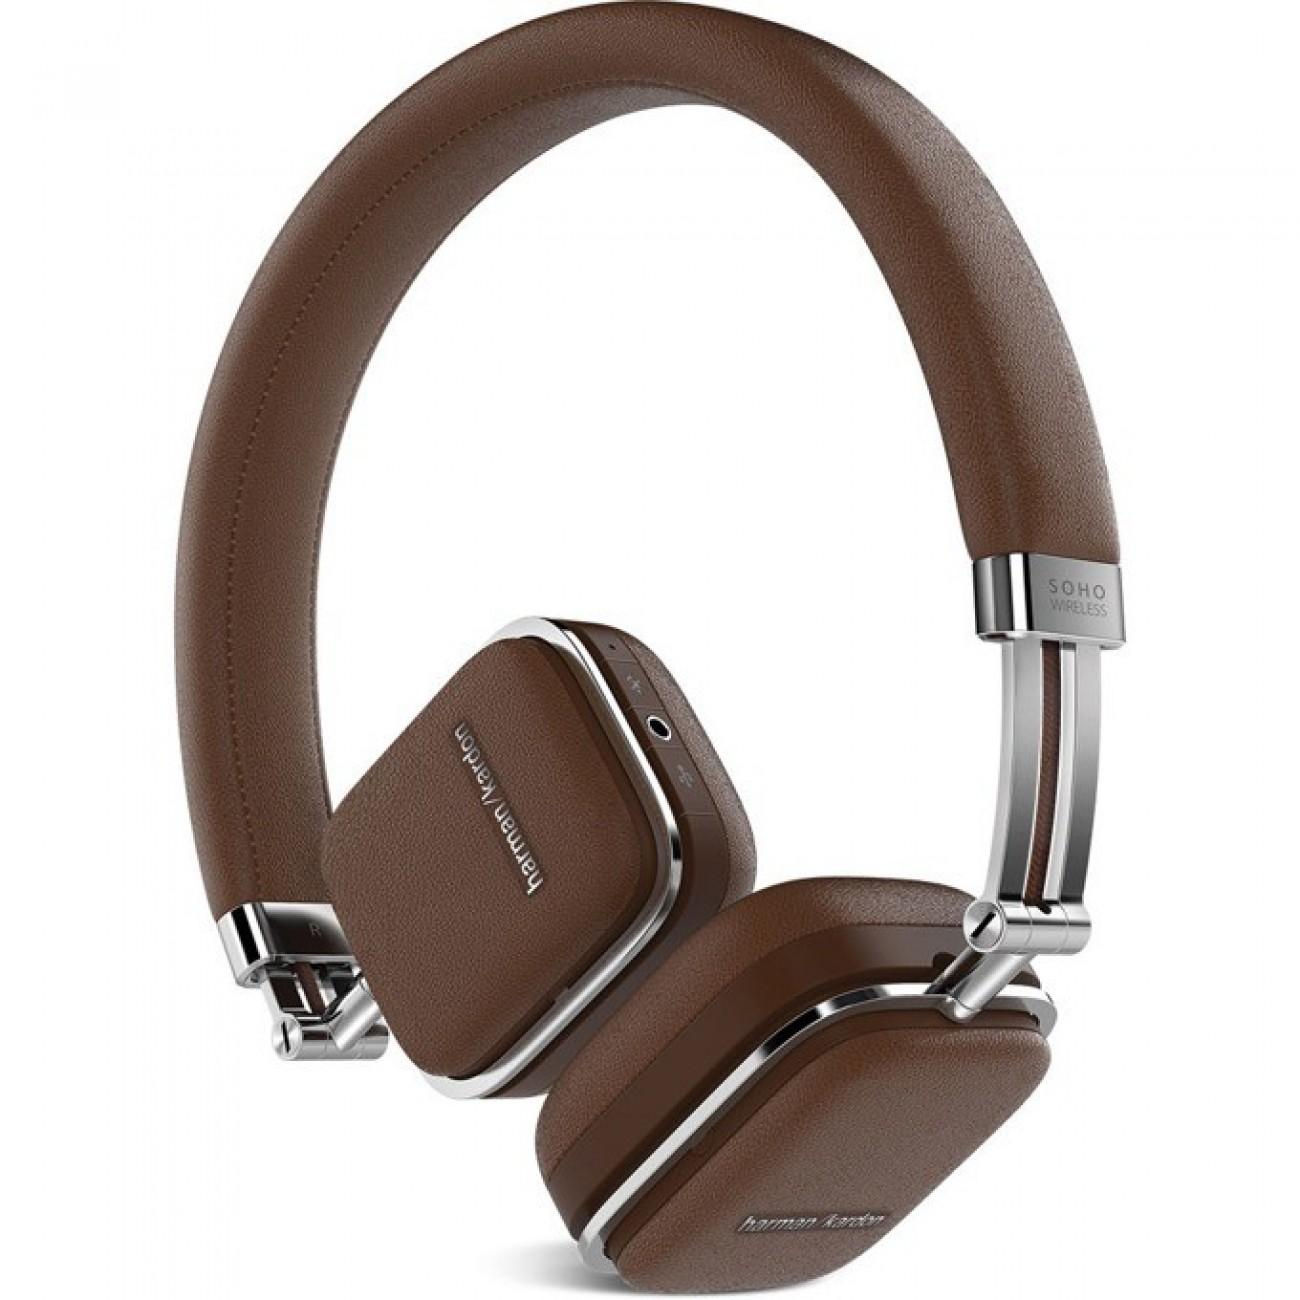 Слушалки Harman Kardon SOHO BT, безжични, микрофон, управление на звука, кафяви в Слушалки -  | Alleop